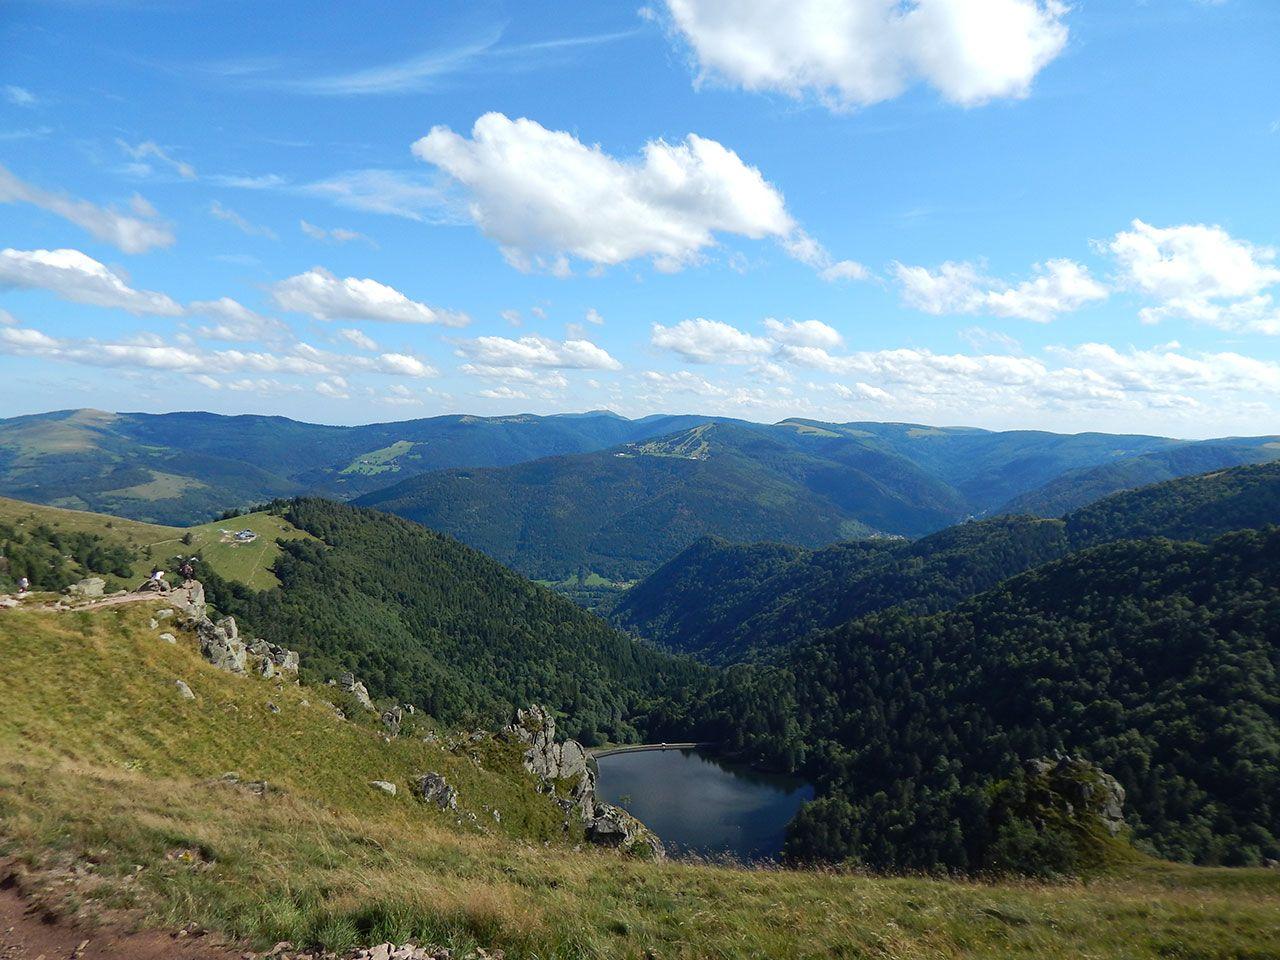 Felsenpfad Col De La Schlucht Frankenthal Le Hohneck Vogesen Felsenweg Und Reisen